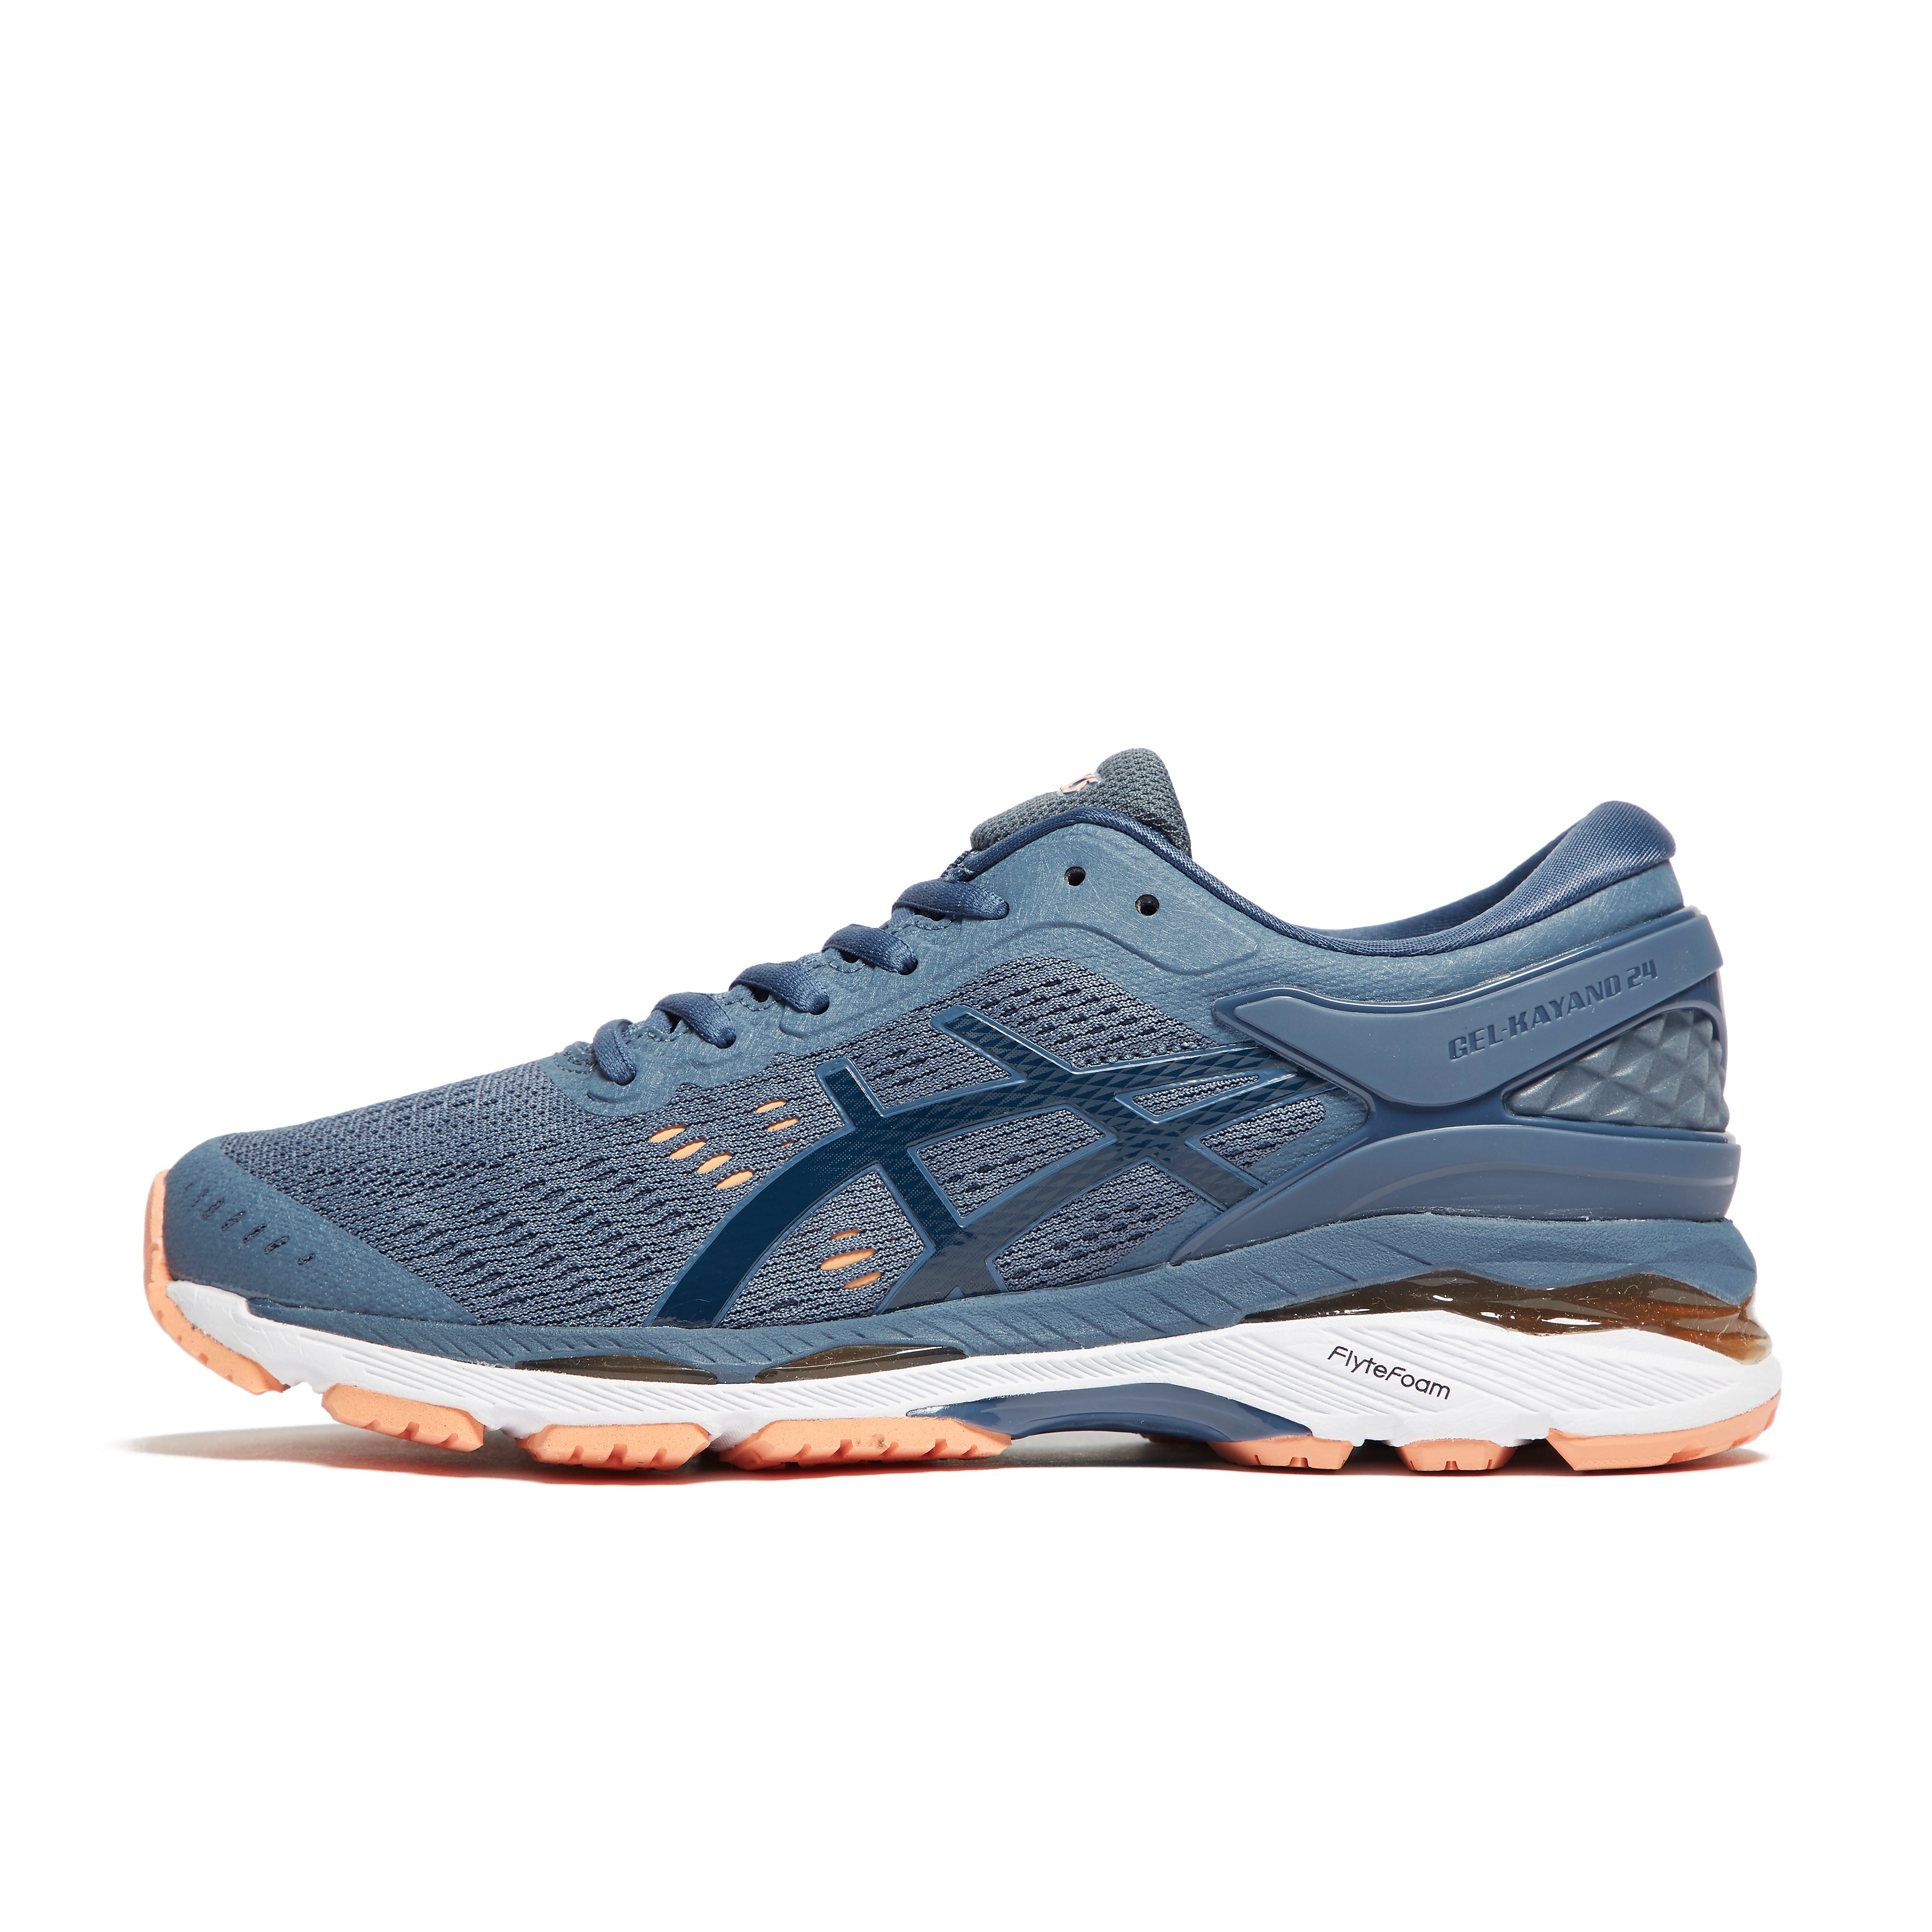 Women's ASICS GEL KAYANO 24 RUNNING SHOES - Blue, Blue